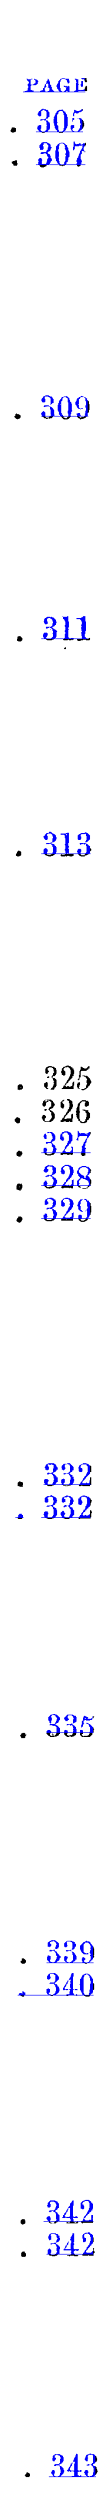 [merged small][ocr errors][merged small][merged small][merged small][ocr errors][ocr errors][merged small][ocr errors]